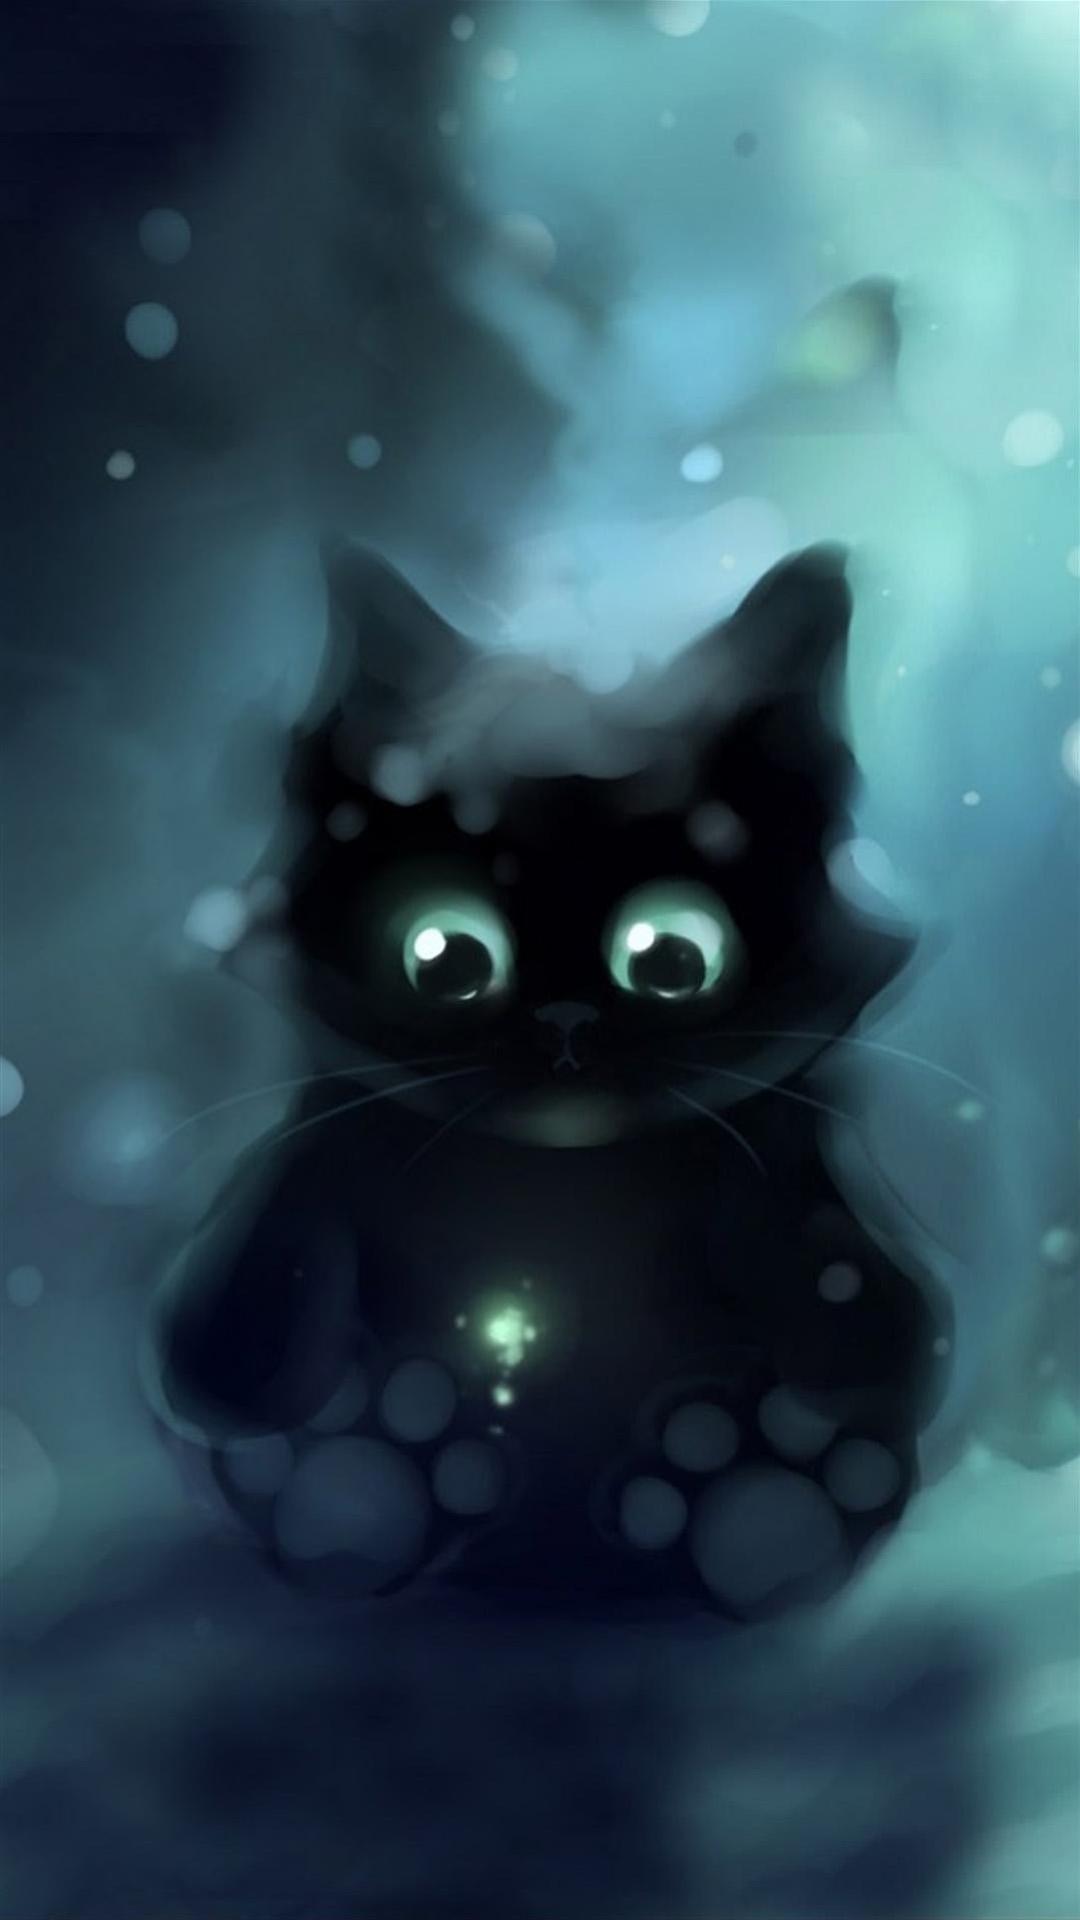 Cat Iphone Wallpapers: Galaxy Cat IPhone Wallpaper